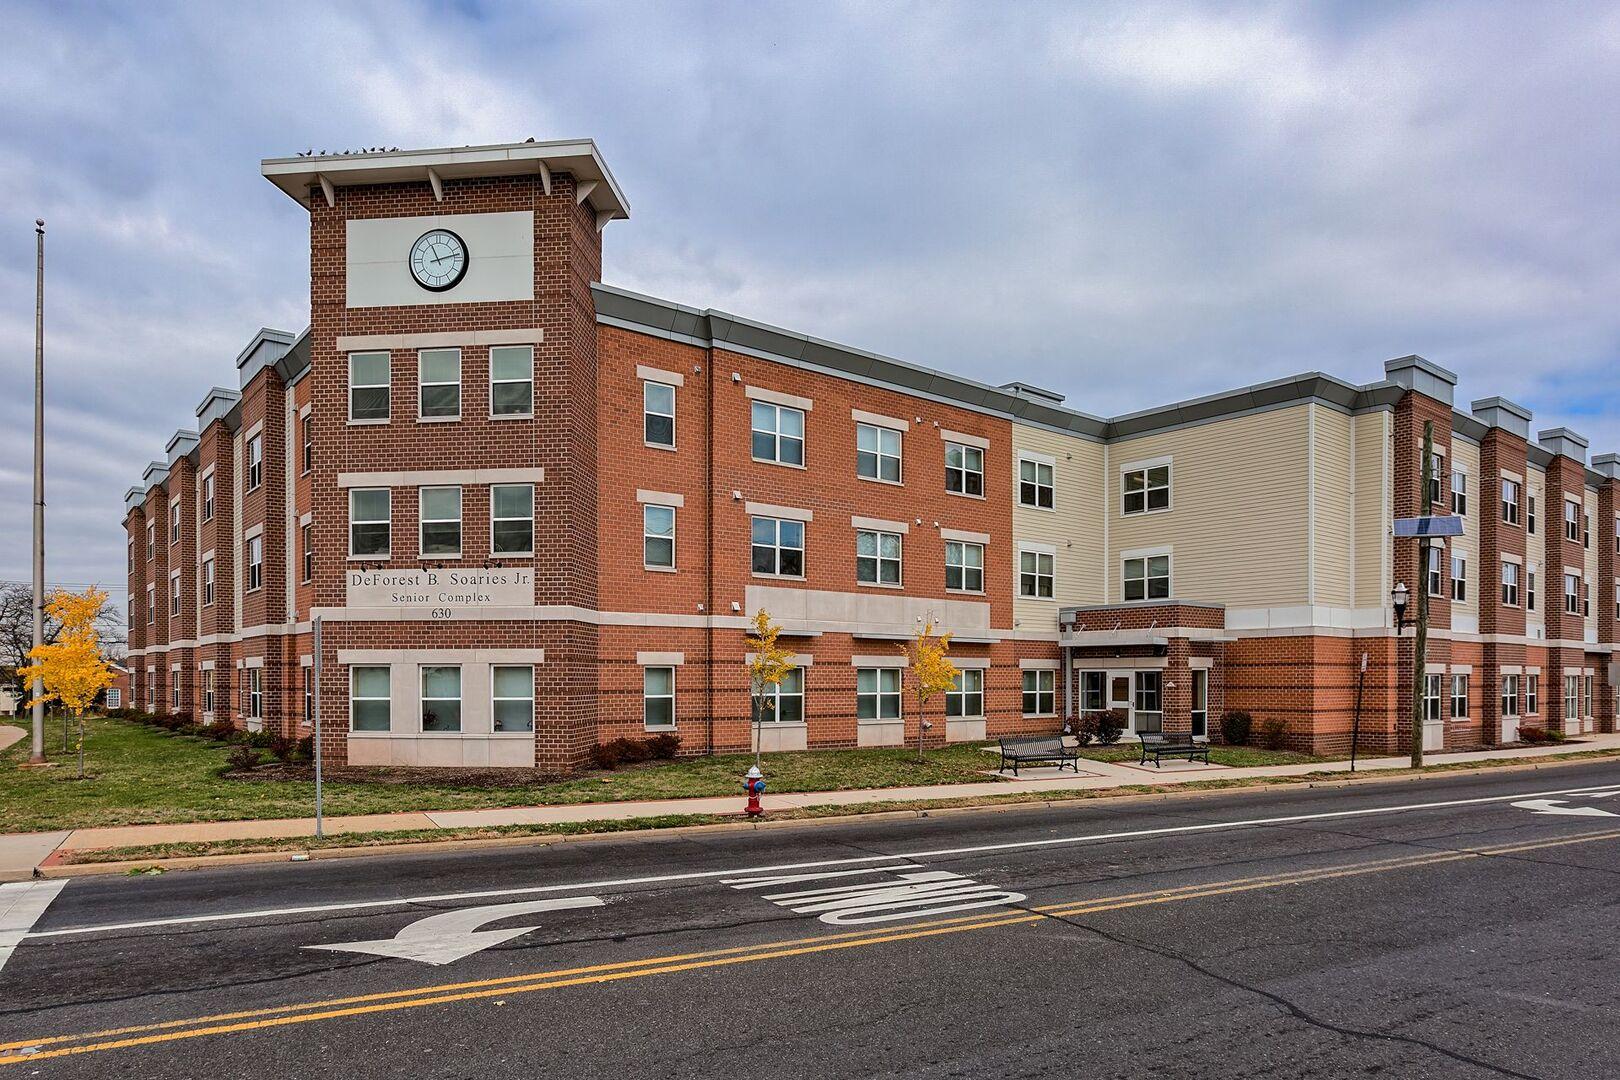 Apartments for Rent in Somerset, NJ | Deforest Soaries Jr Residences ...